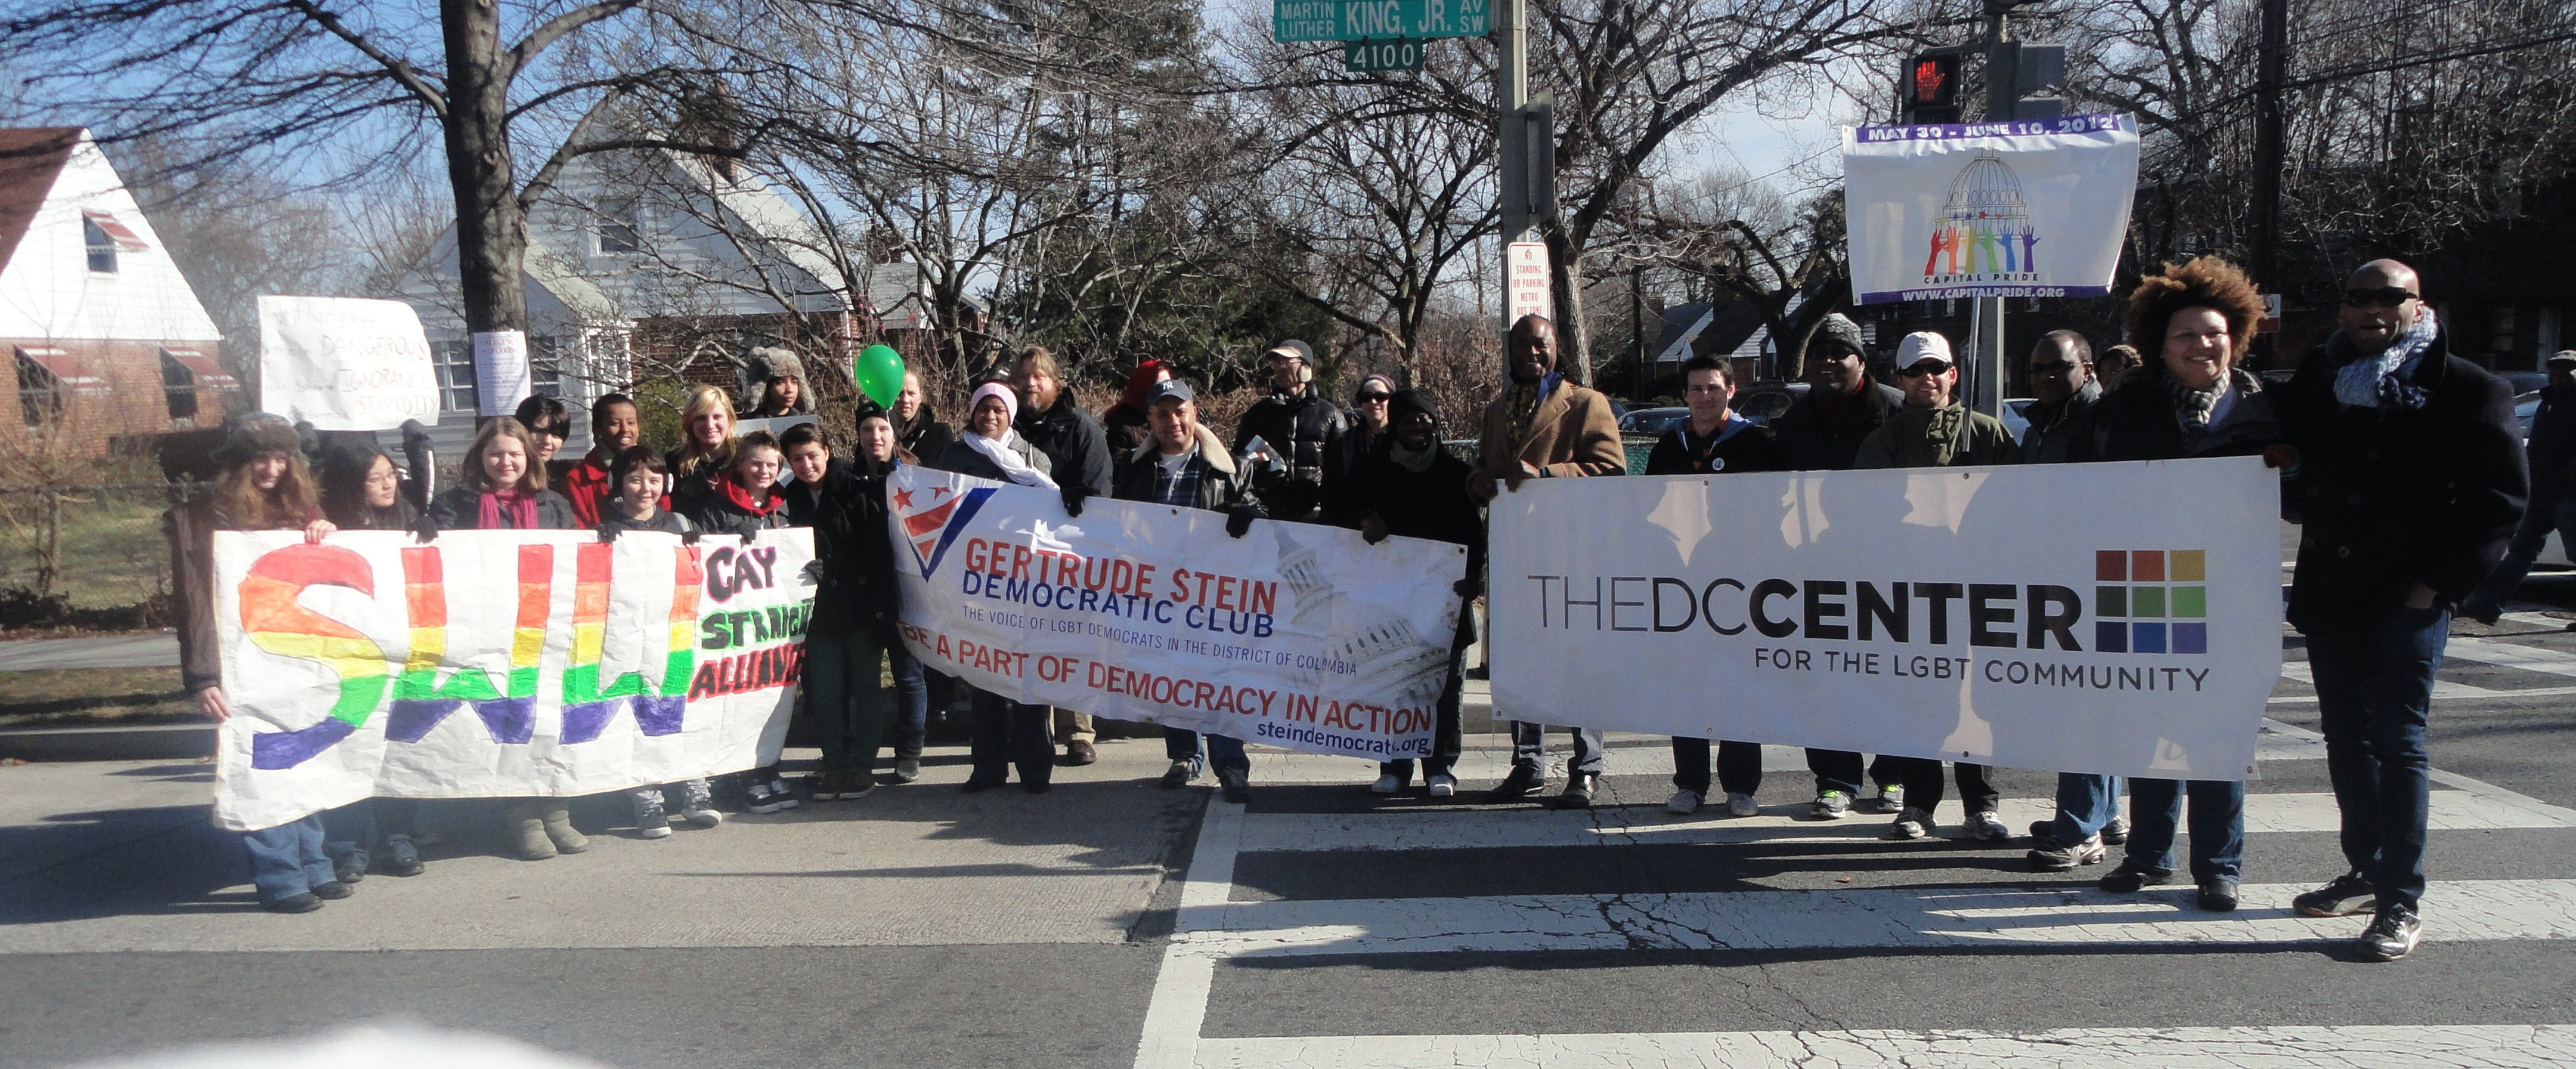 LGBT Contingent at the MLK Holiday Parade